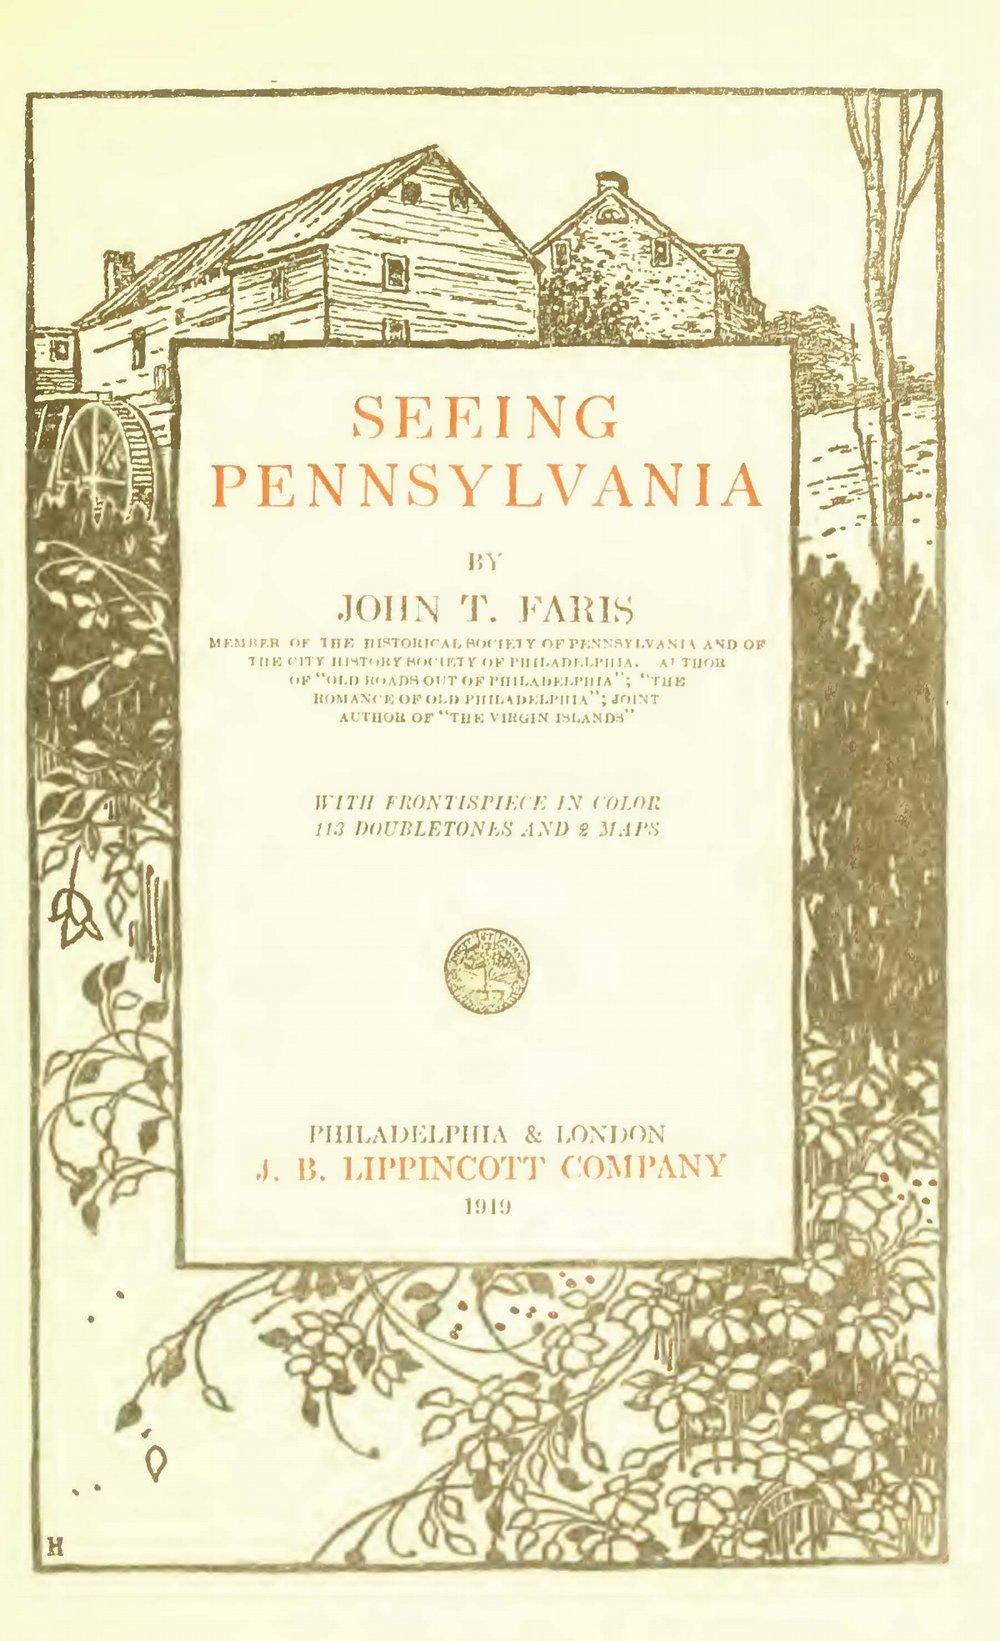 Faris, John Thomson, Seeing Pennsylvania Title Page.jpg